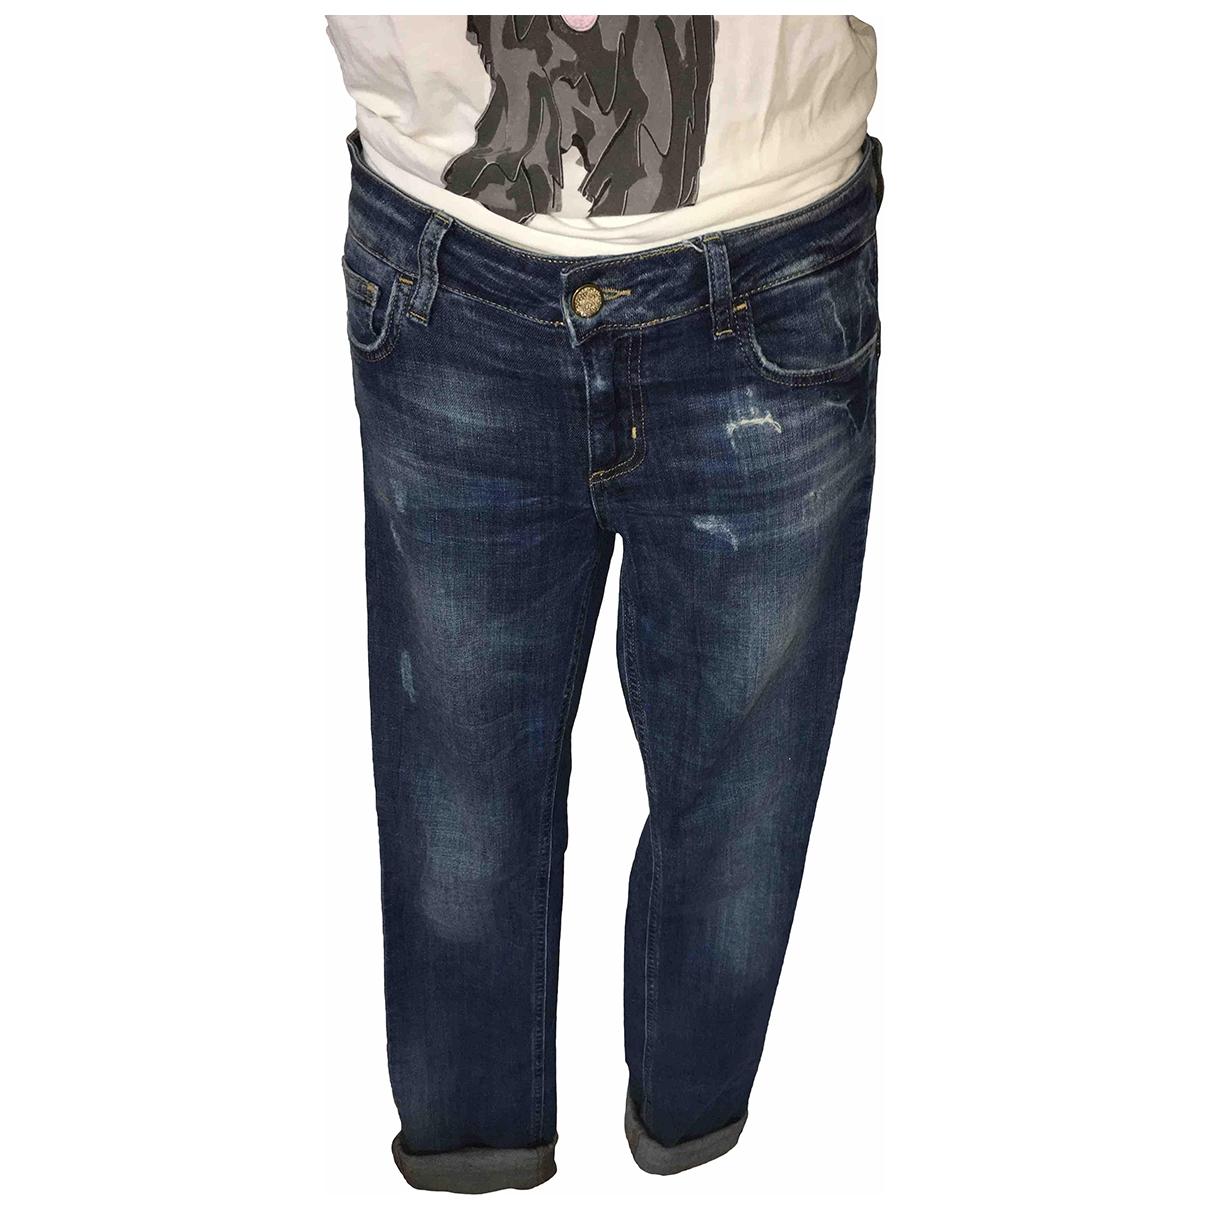 Liu.jo \N Blue Cotton - elasthane Jeans for Women 28 US